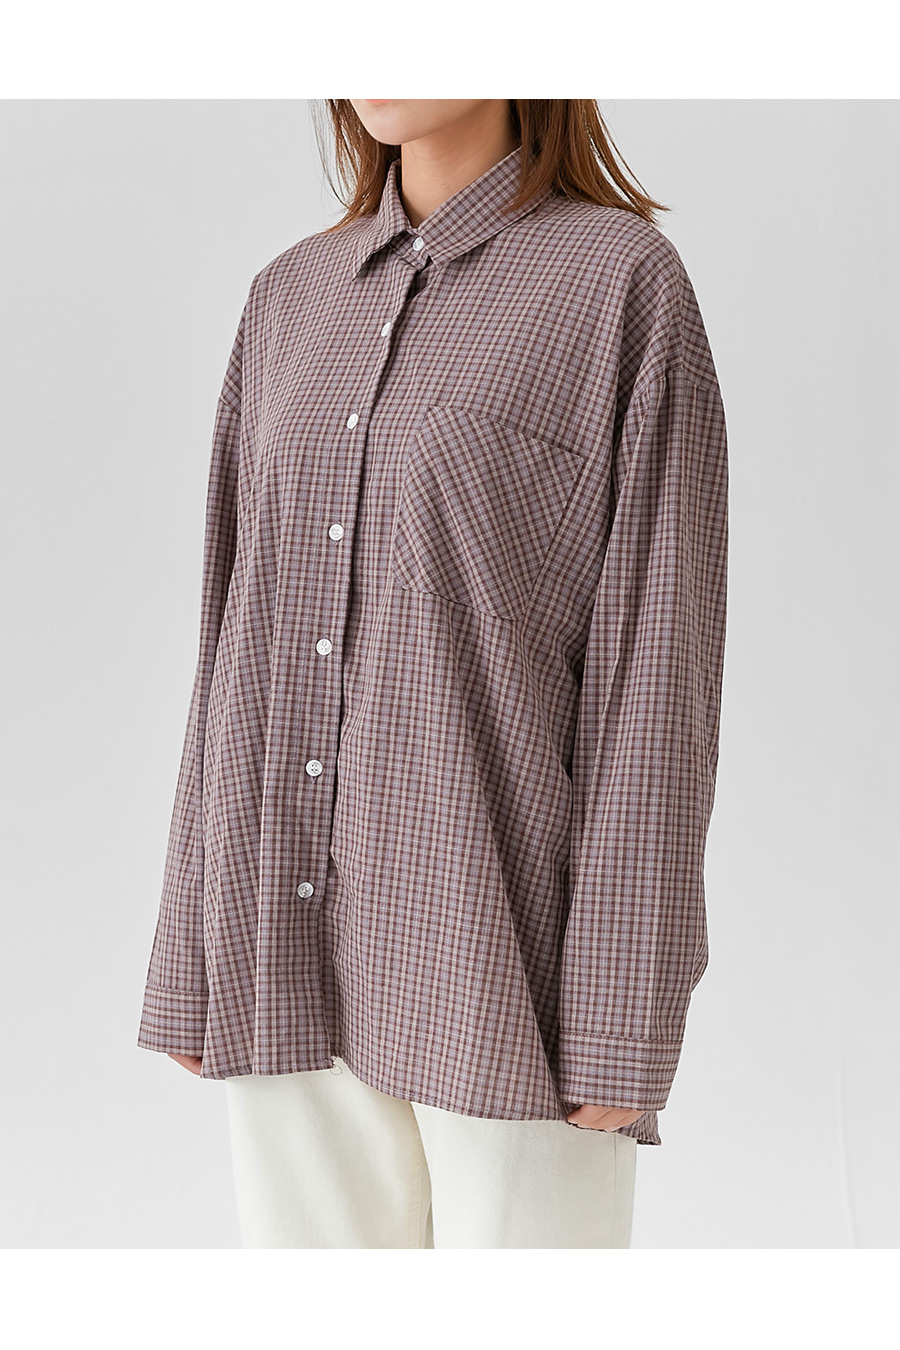 Mas Overfit Check Shirt